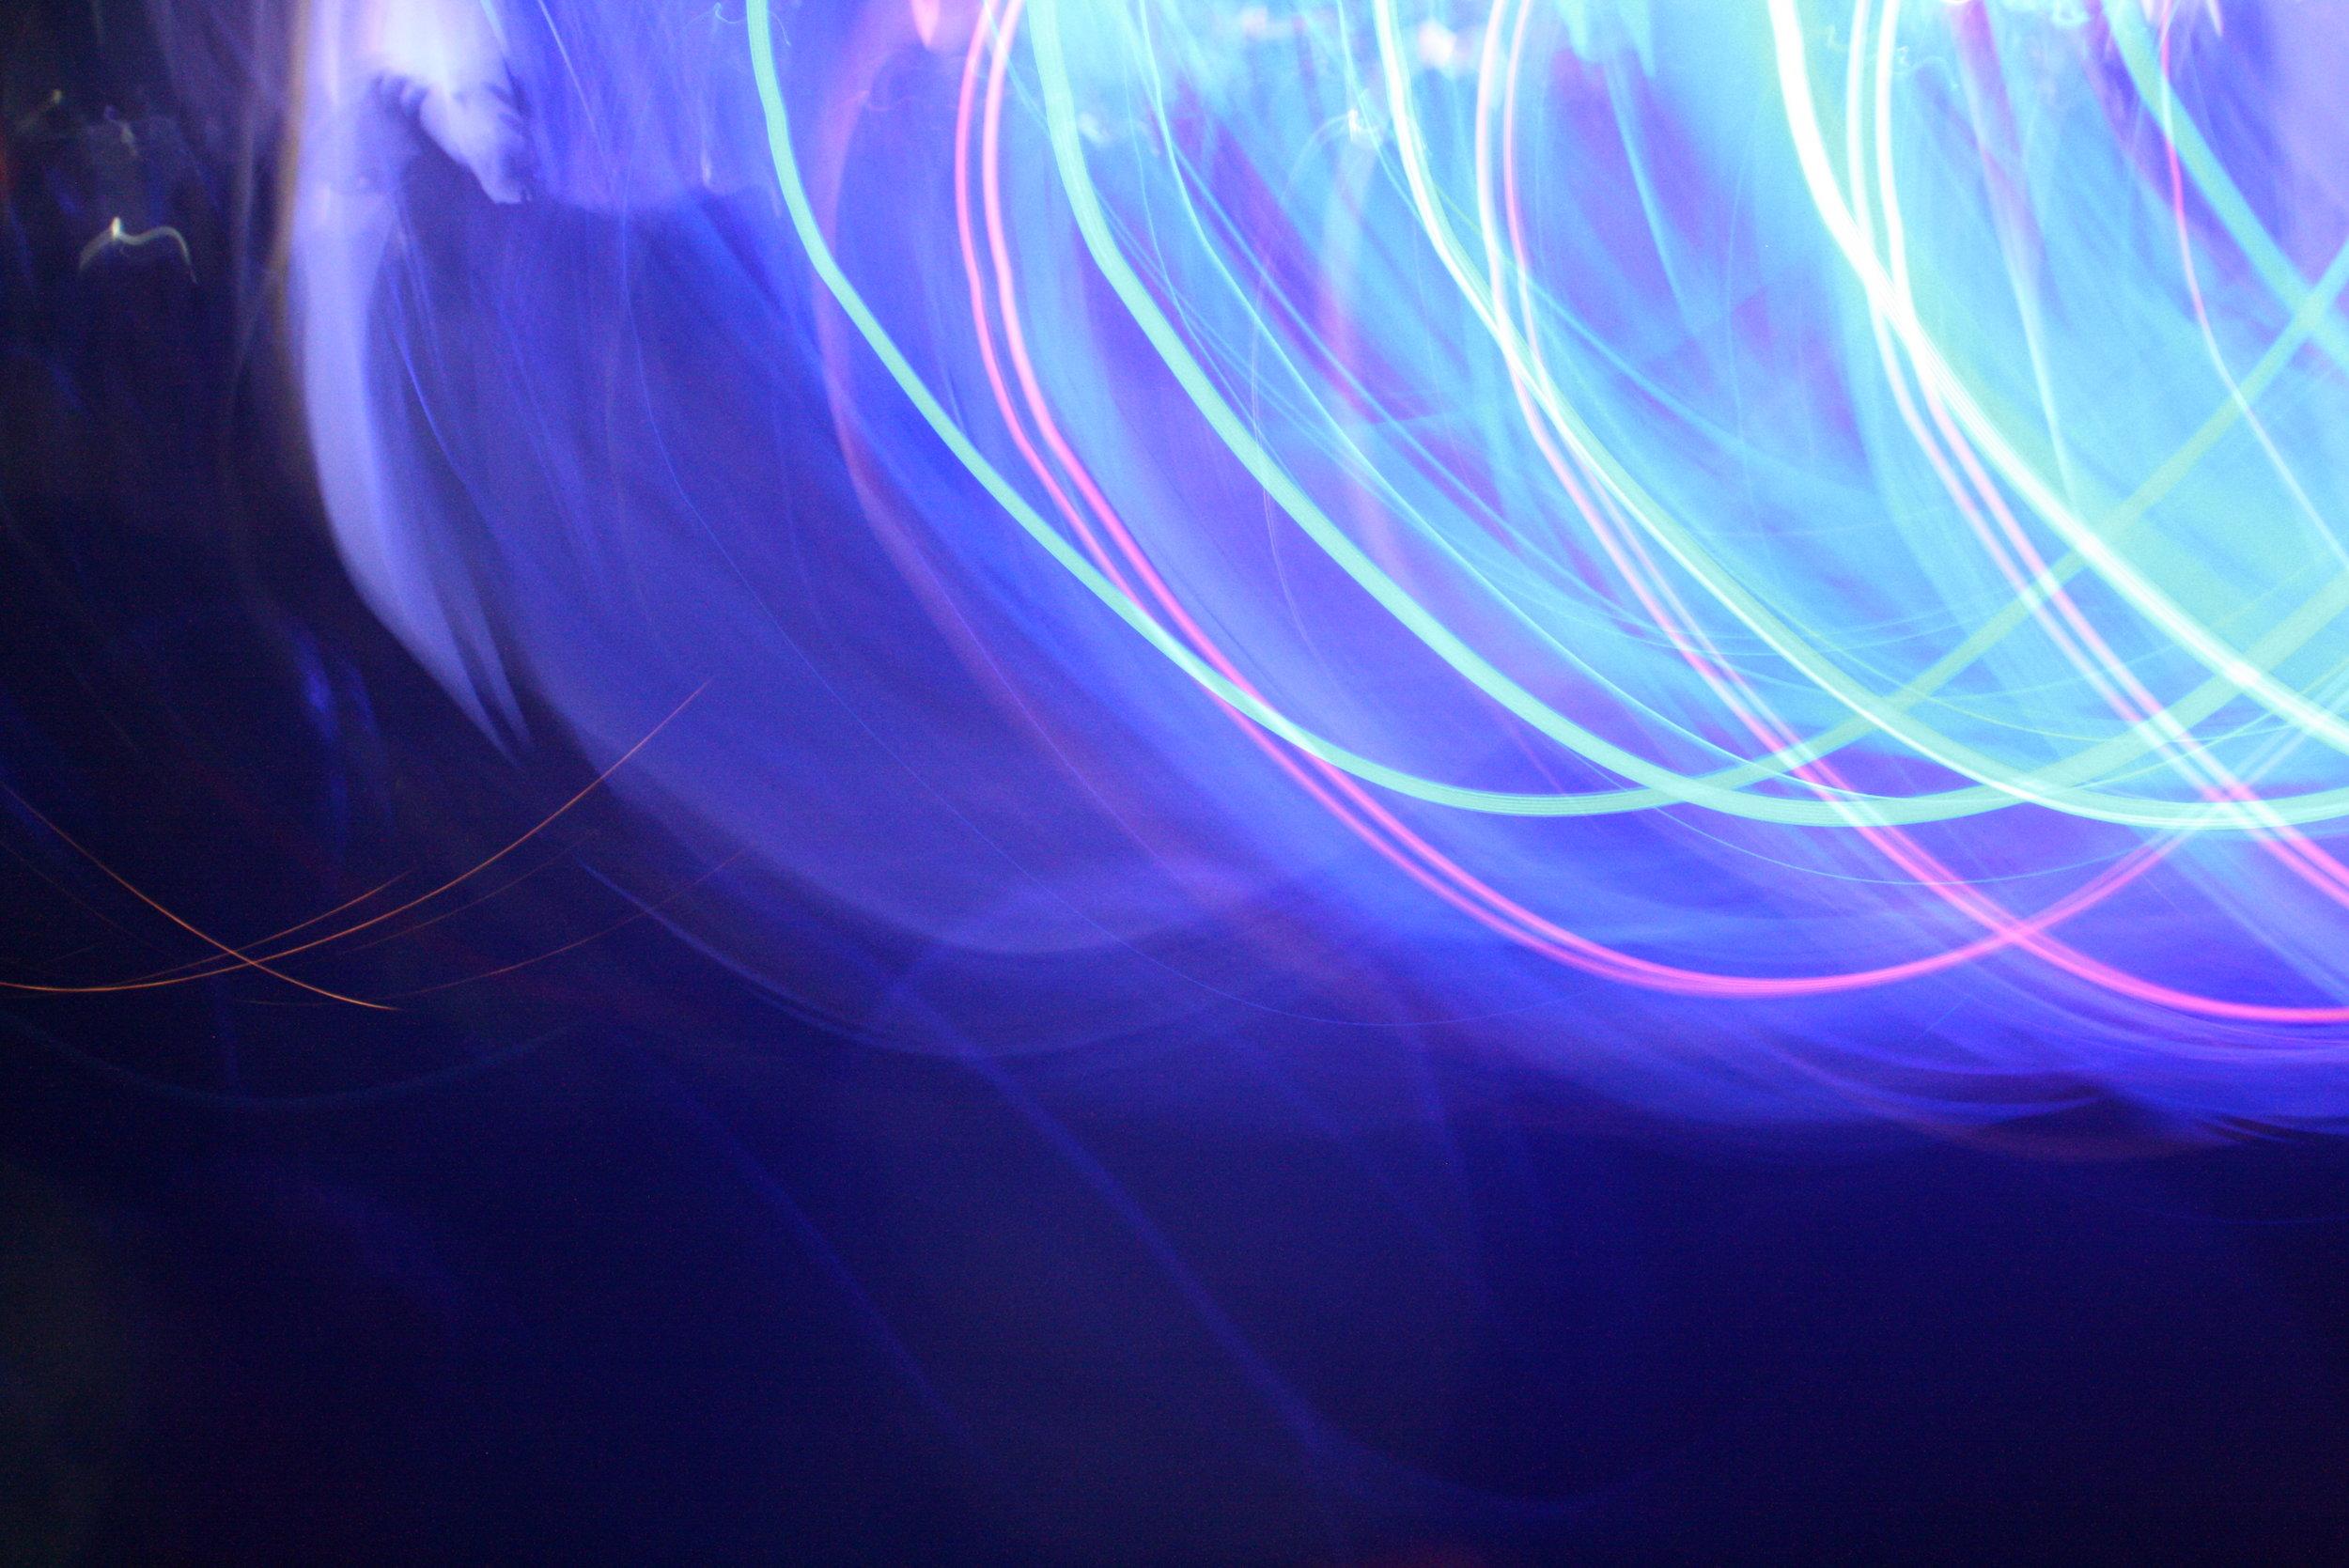 Water Glow